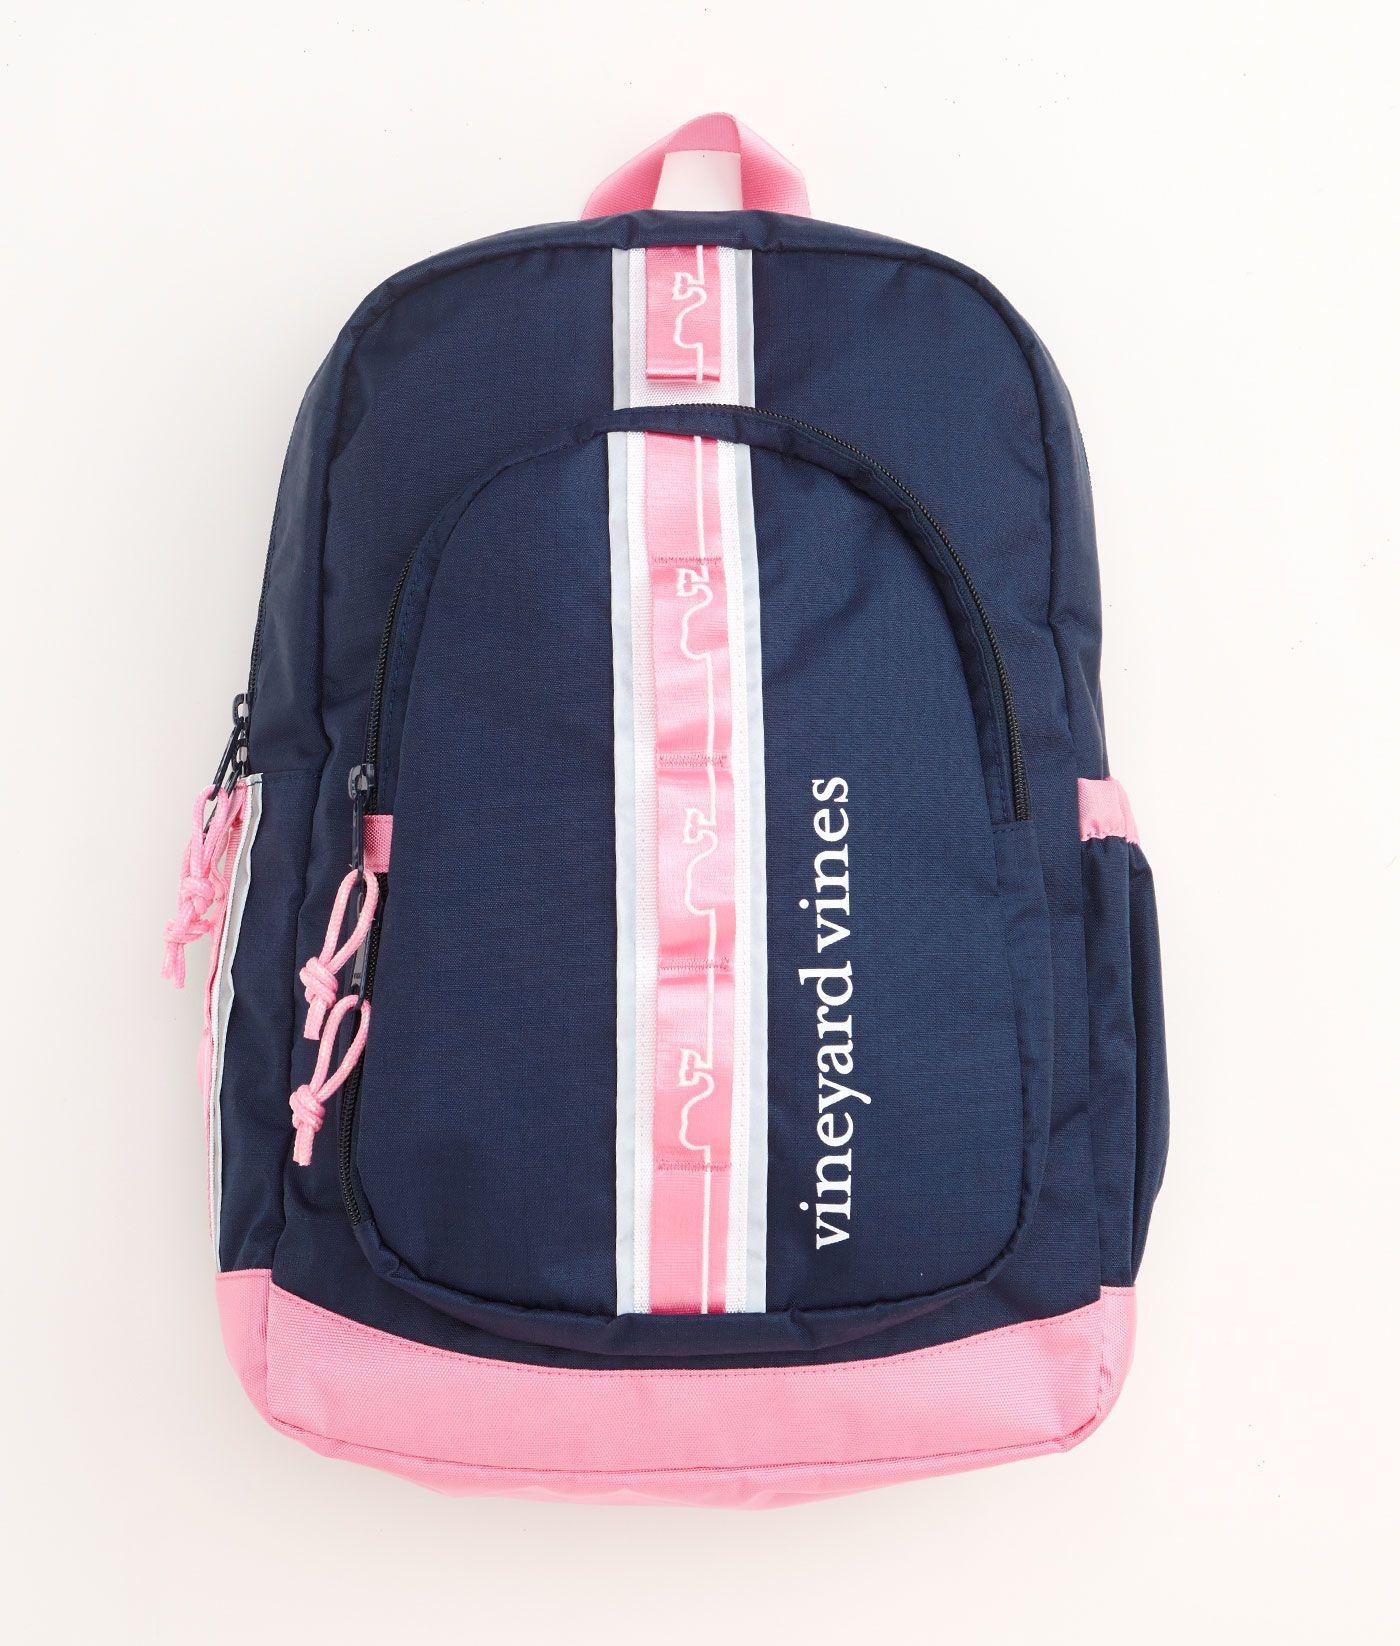 Shop Spring Tech Backpack at vineyard vines  f7acb4b82a5a3